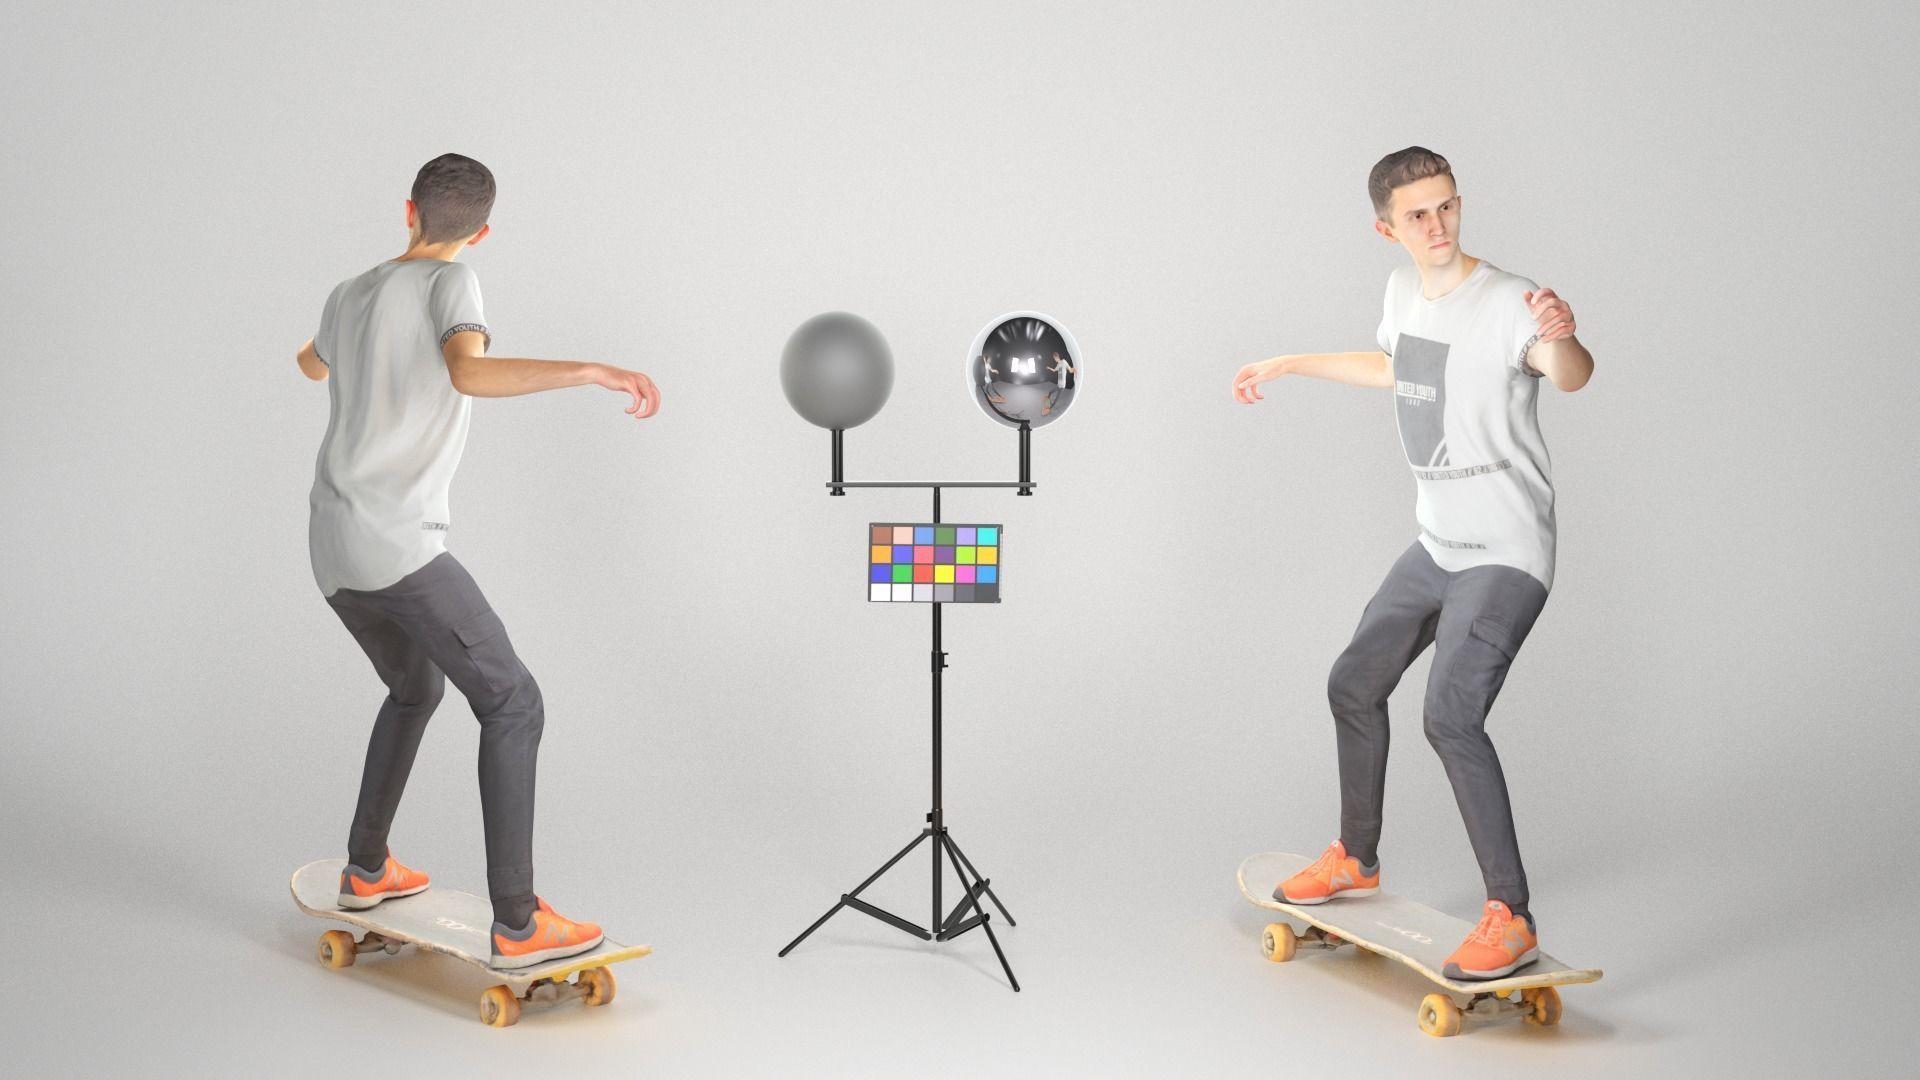 Animated man riding on a skateboard 35